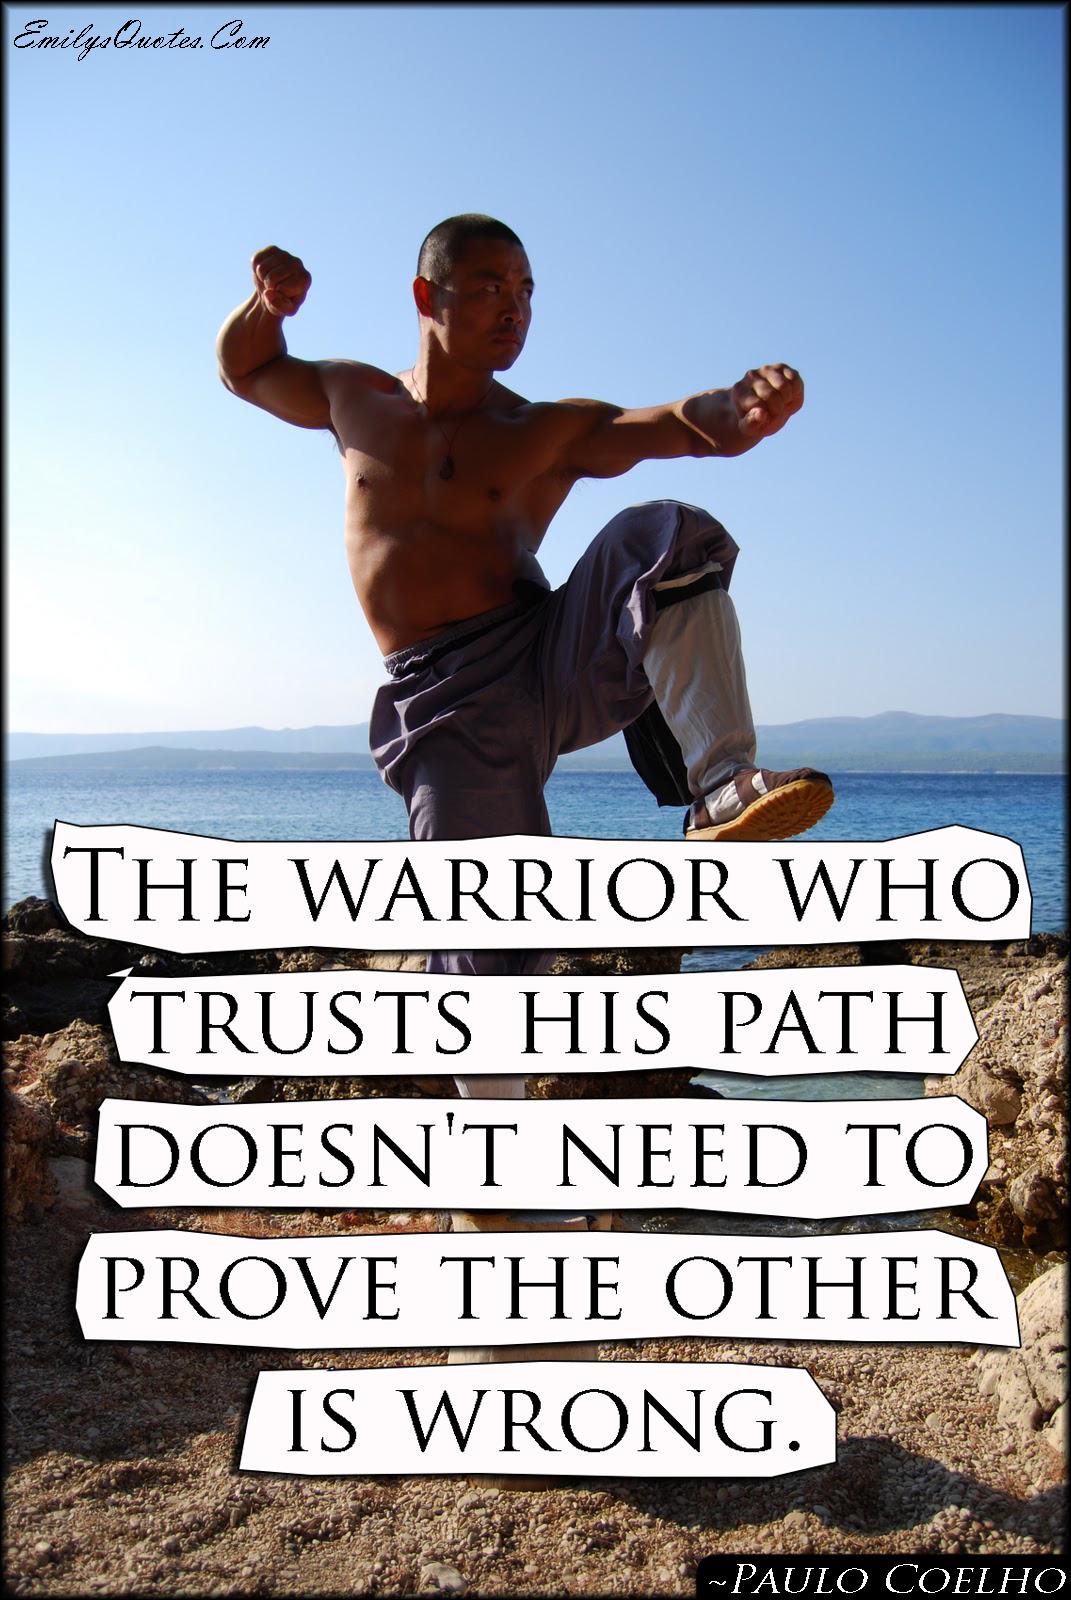 EmilysQuotes.Com - warrior, trust, path, need, prove, mistake, wisdom, inspirational, Paulo Coelho